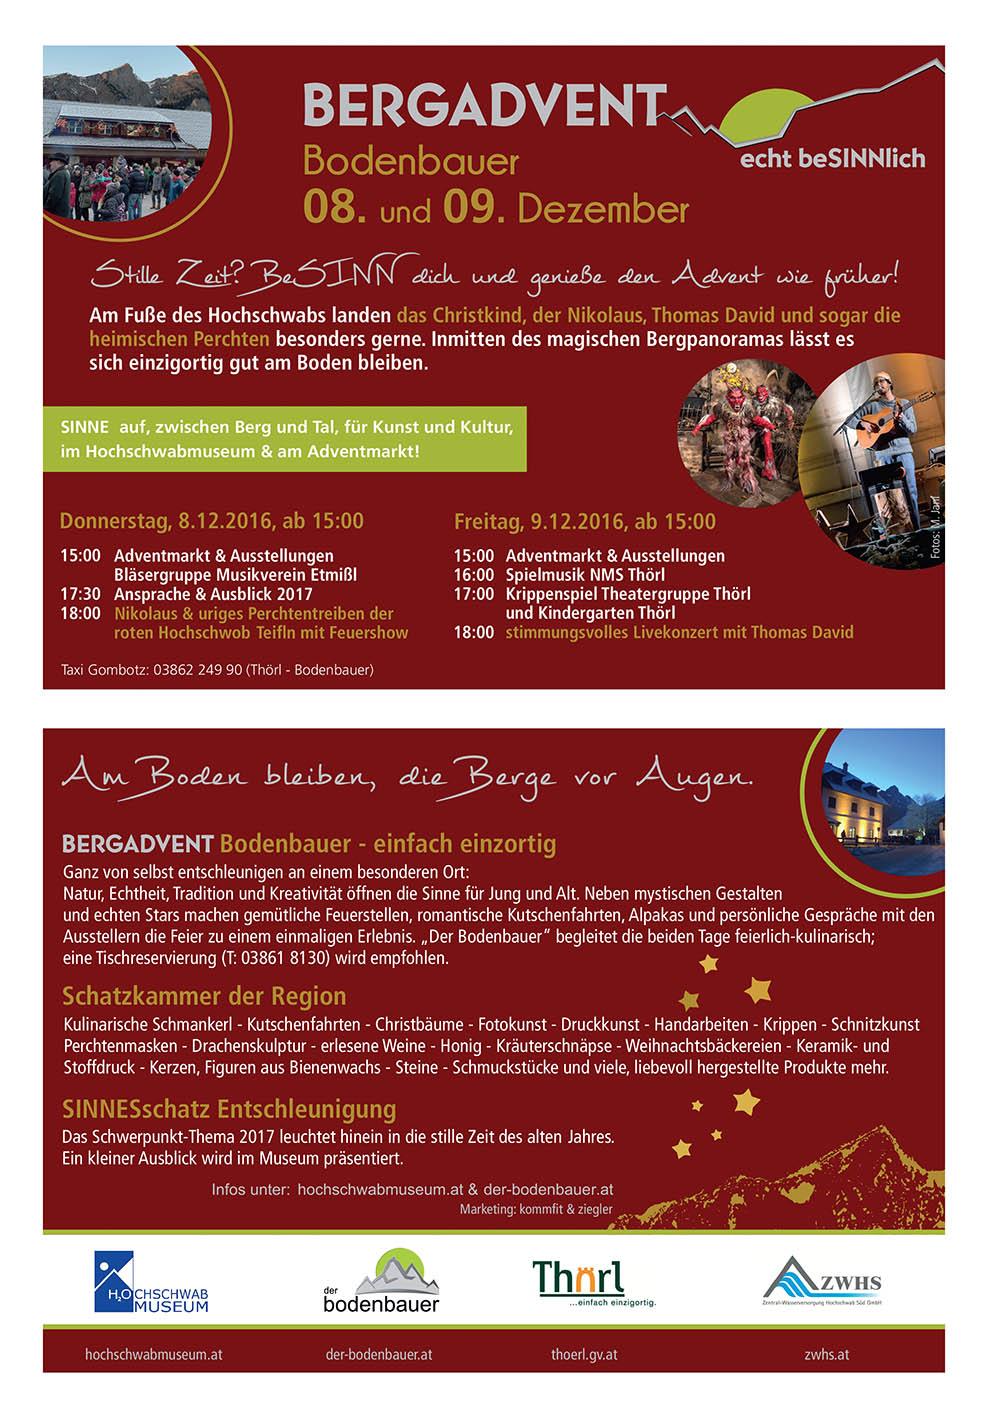 Tourismusprojekt als Besuchermagnet:  Full Service Marketing online & offline, Bergadvent Bodenbauer